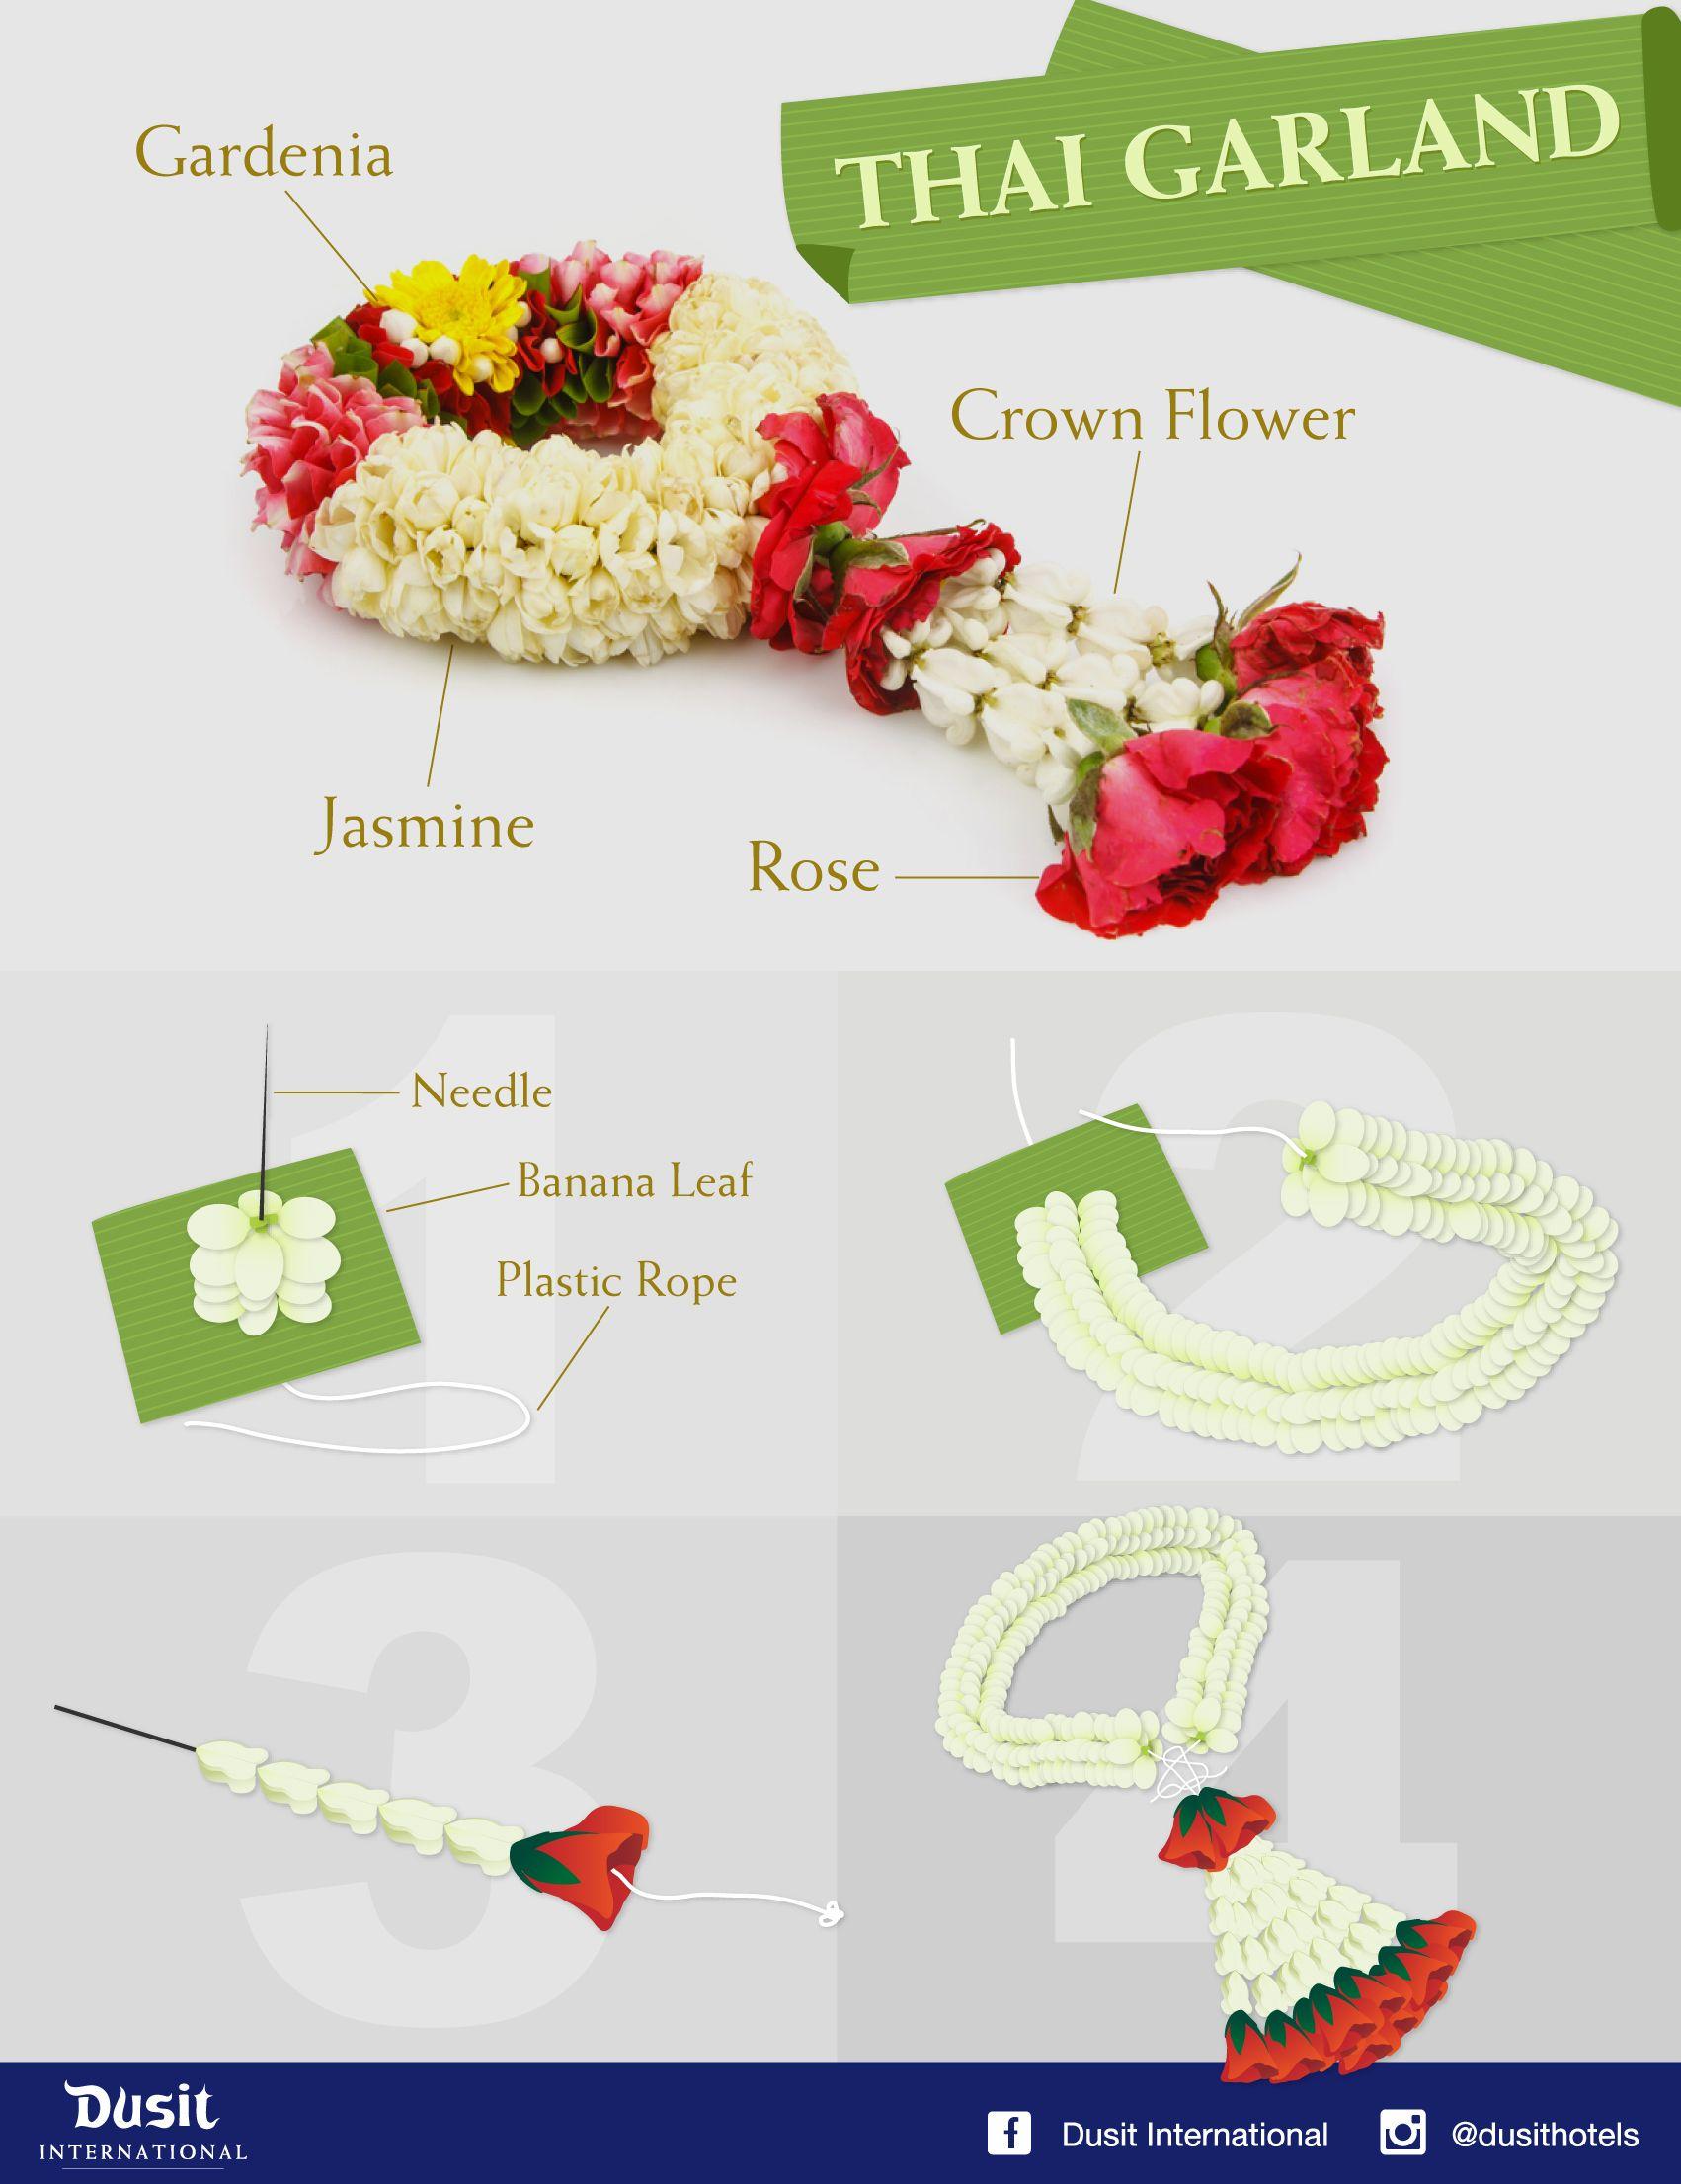 How to make thai garland infographic tips howto tips and how to make thai garland infographic tips howto izmirmasajfo